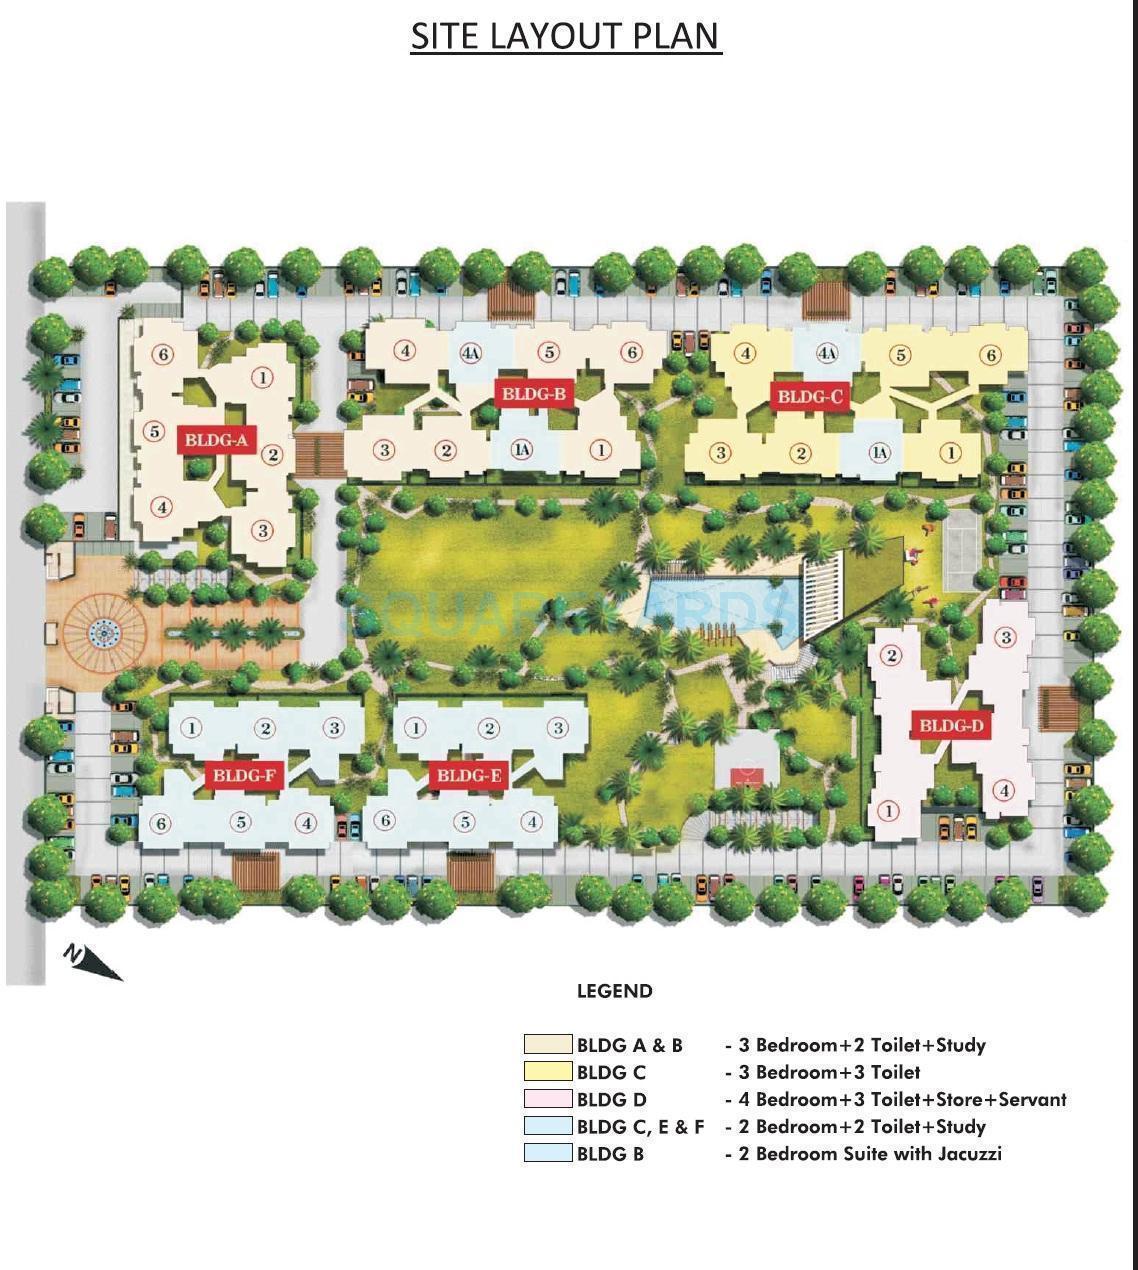 aarcity regency park master plan image1